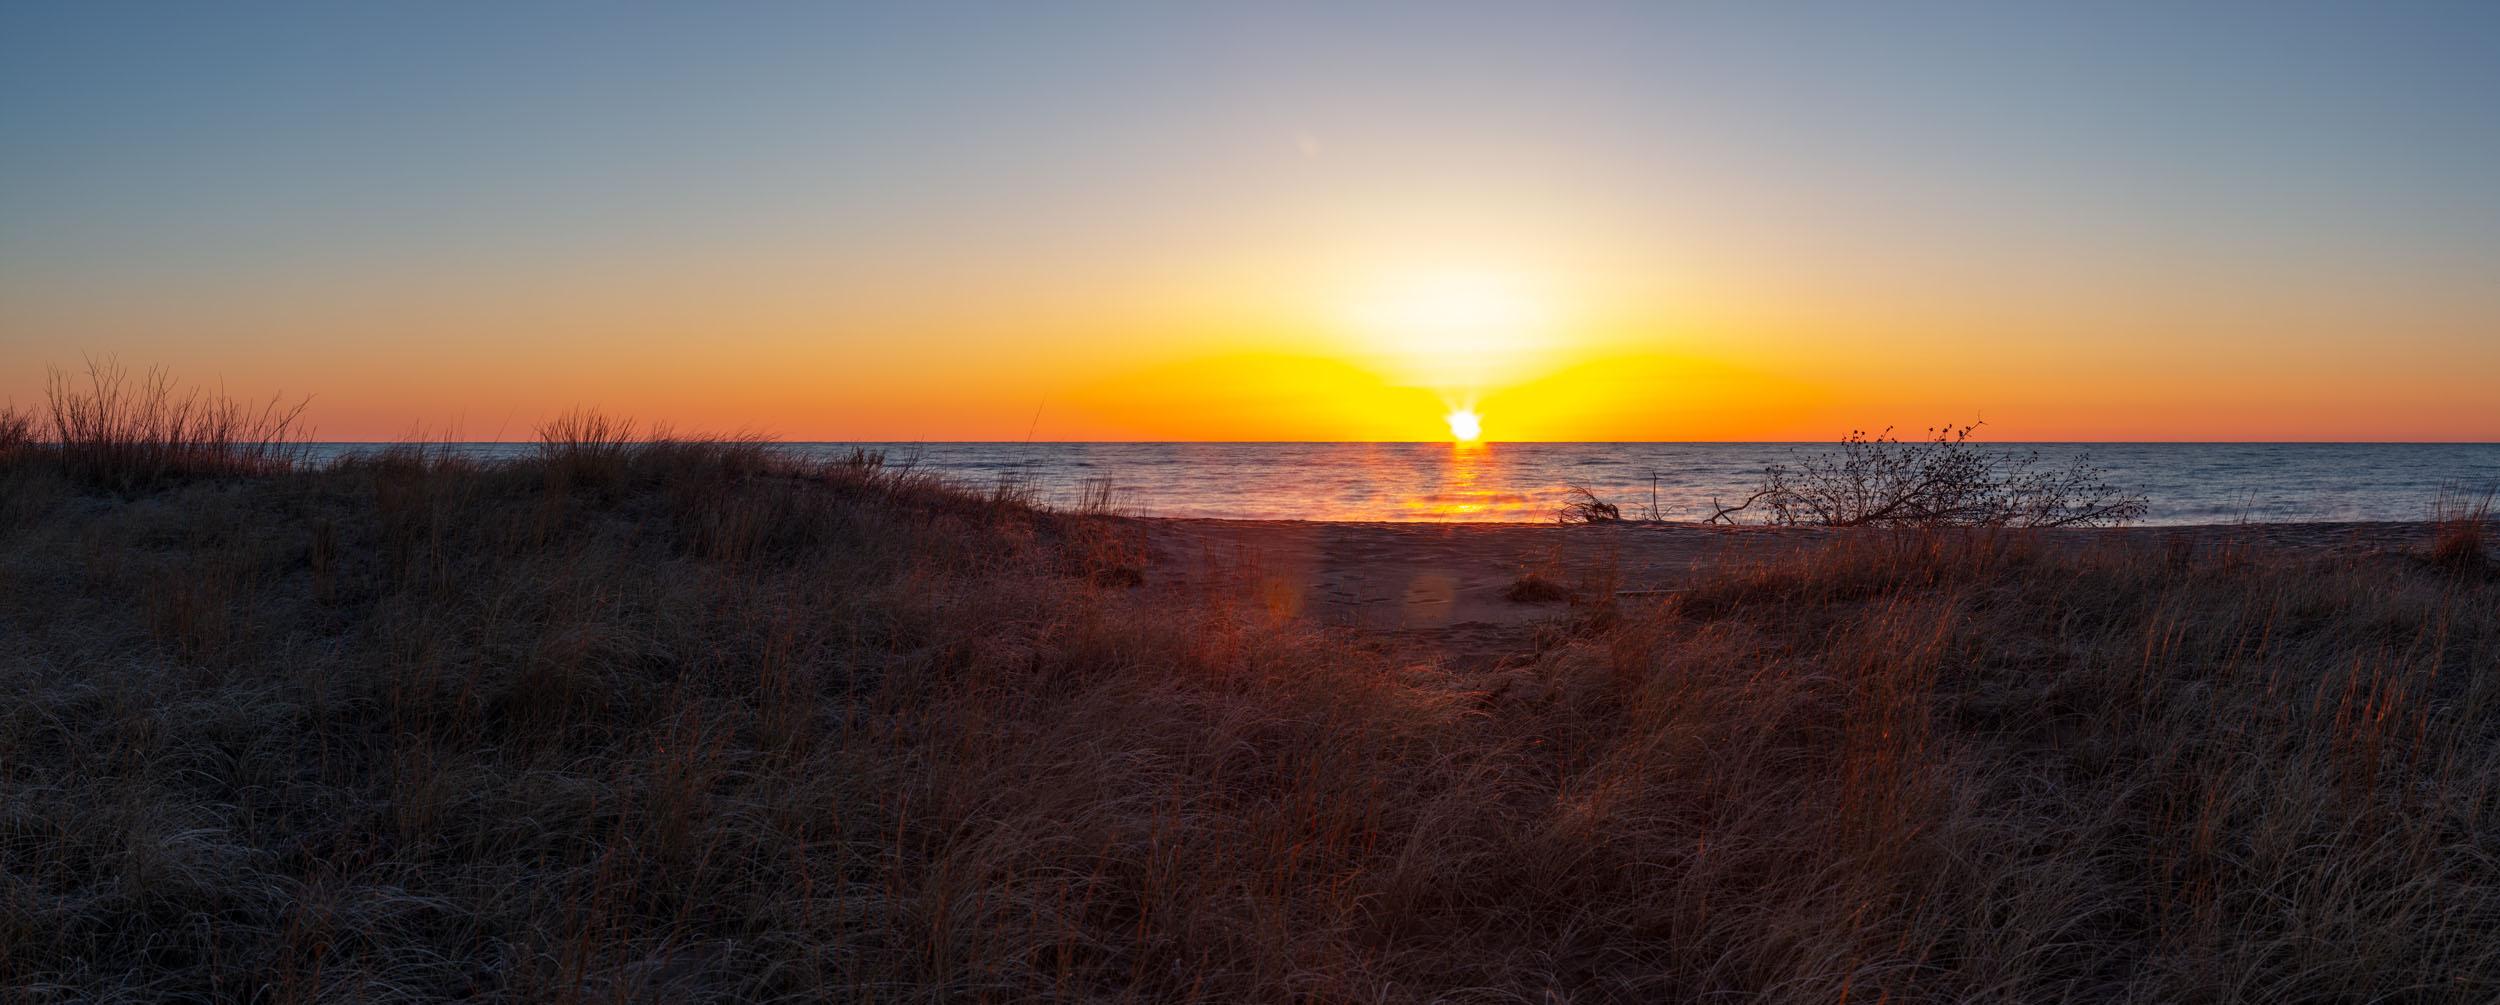 Illinois Beaches, IL